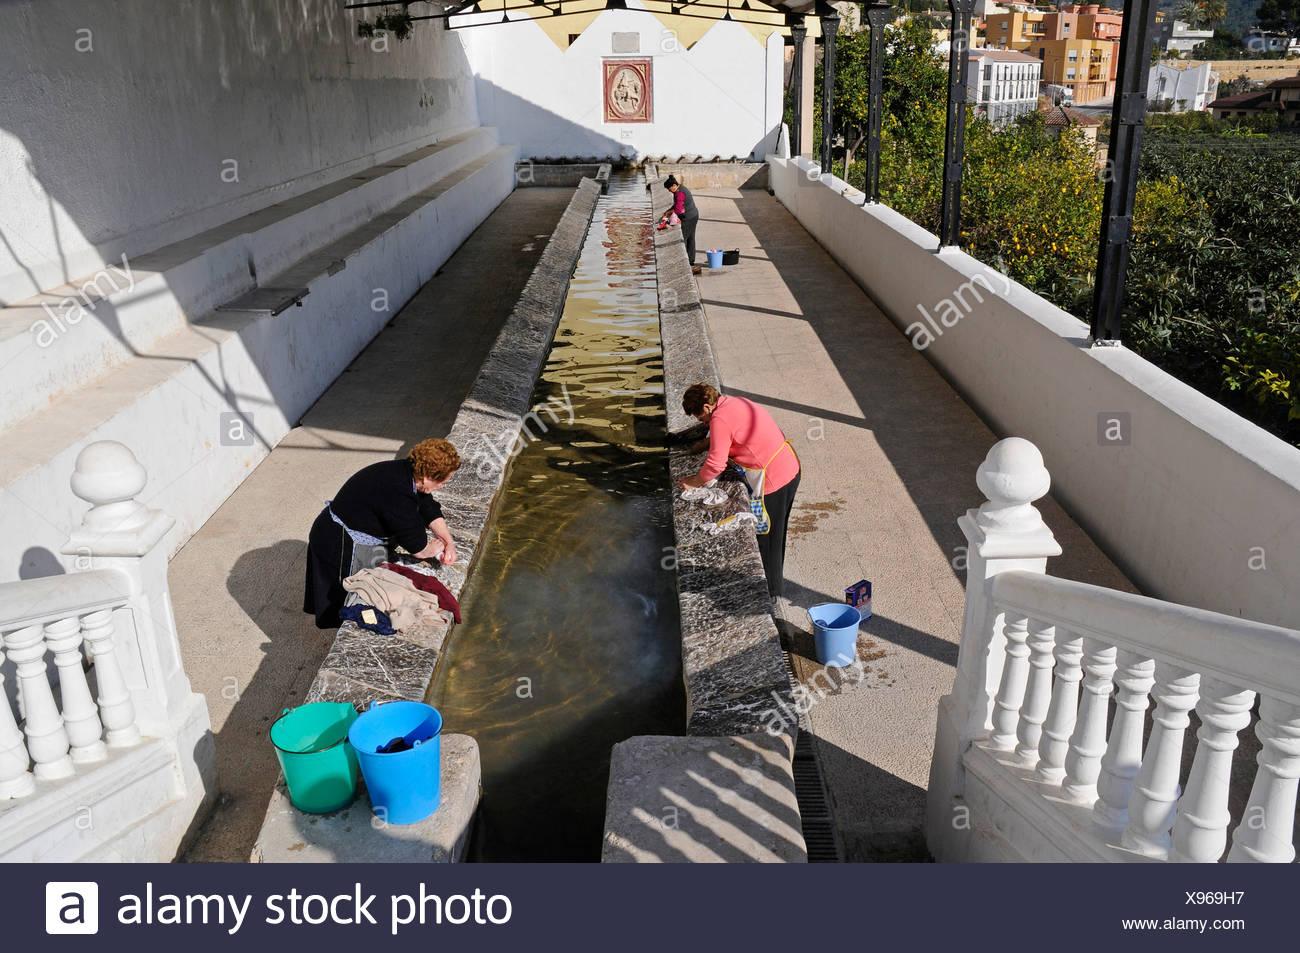 Public laundry area, washing spot, Callosa d'en Sarria, Alicante, Costa Blanca, Spain - Stock Image